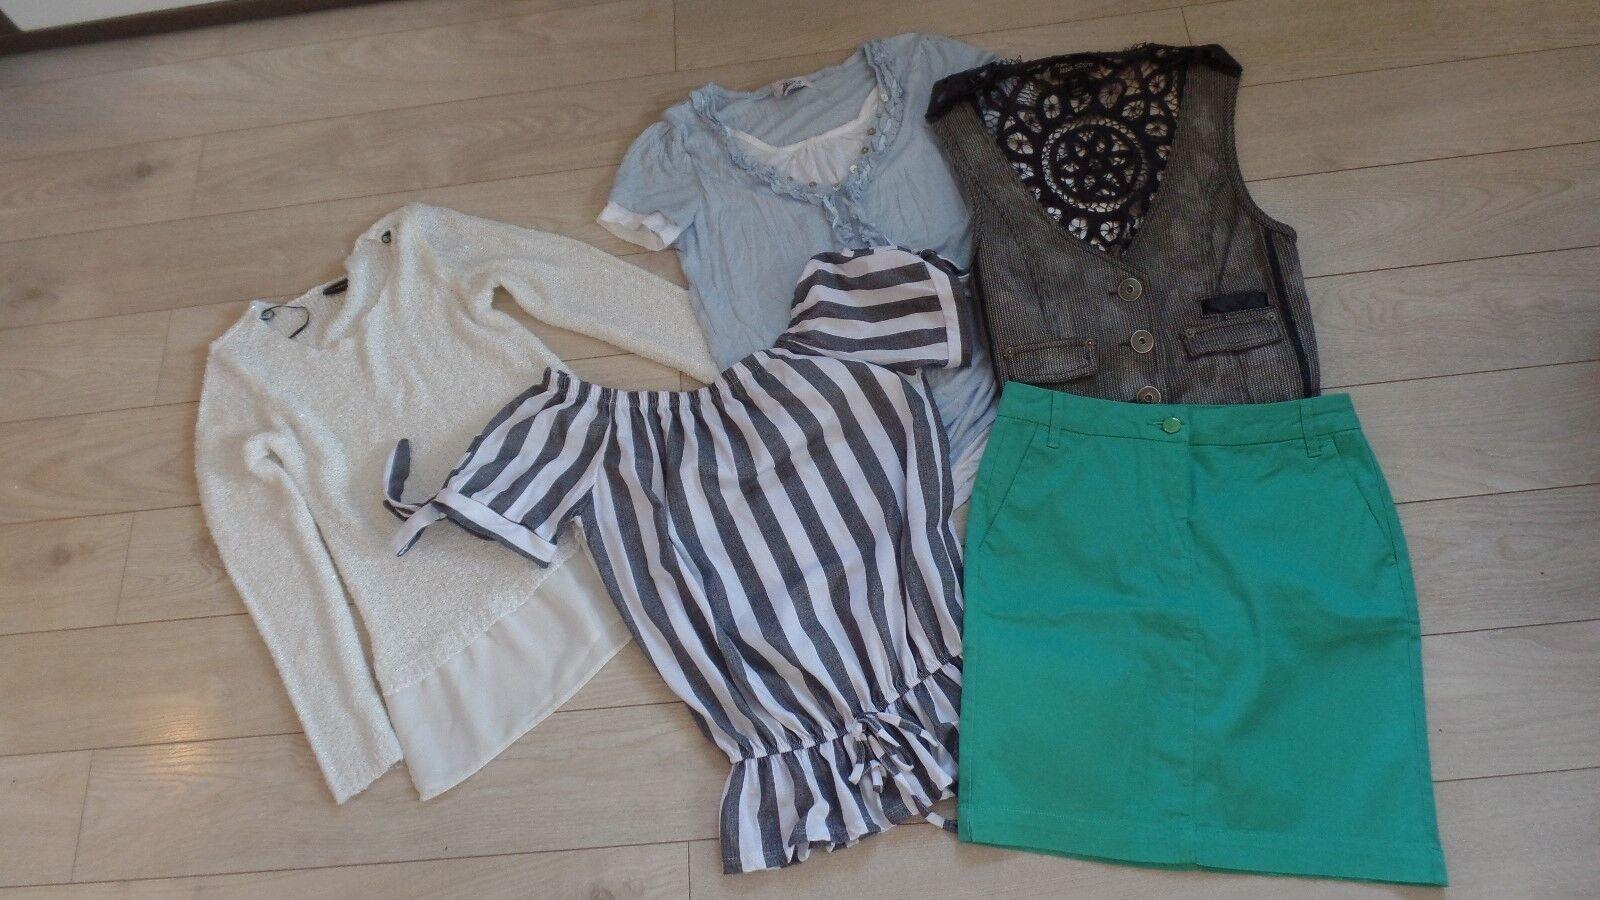 Damen Bekleidungspaket Rock, Pullover, Shirts, Weste Gr. 34/36 NEU